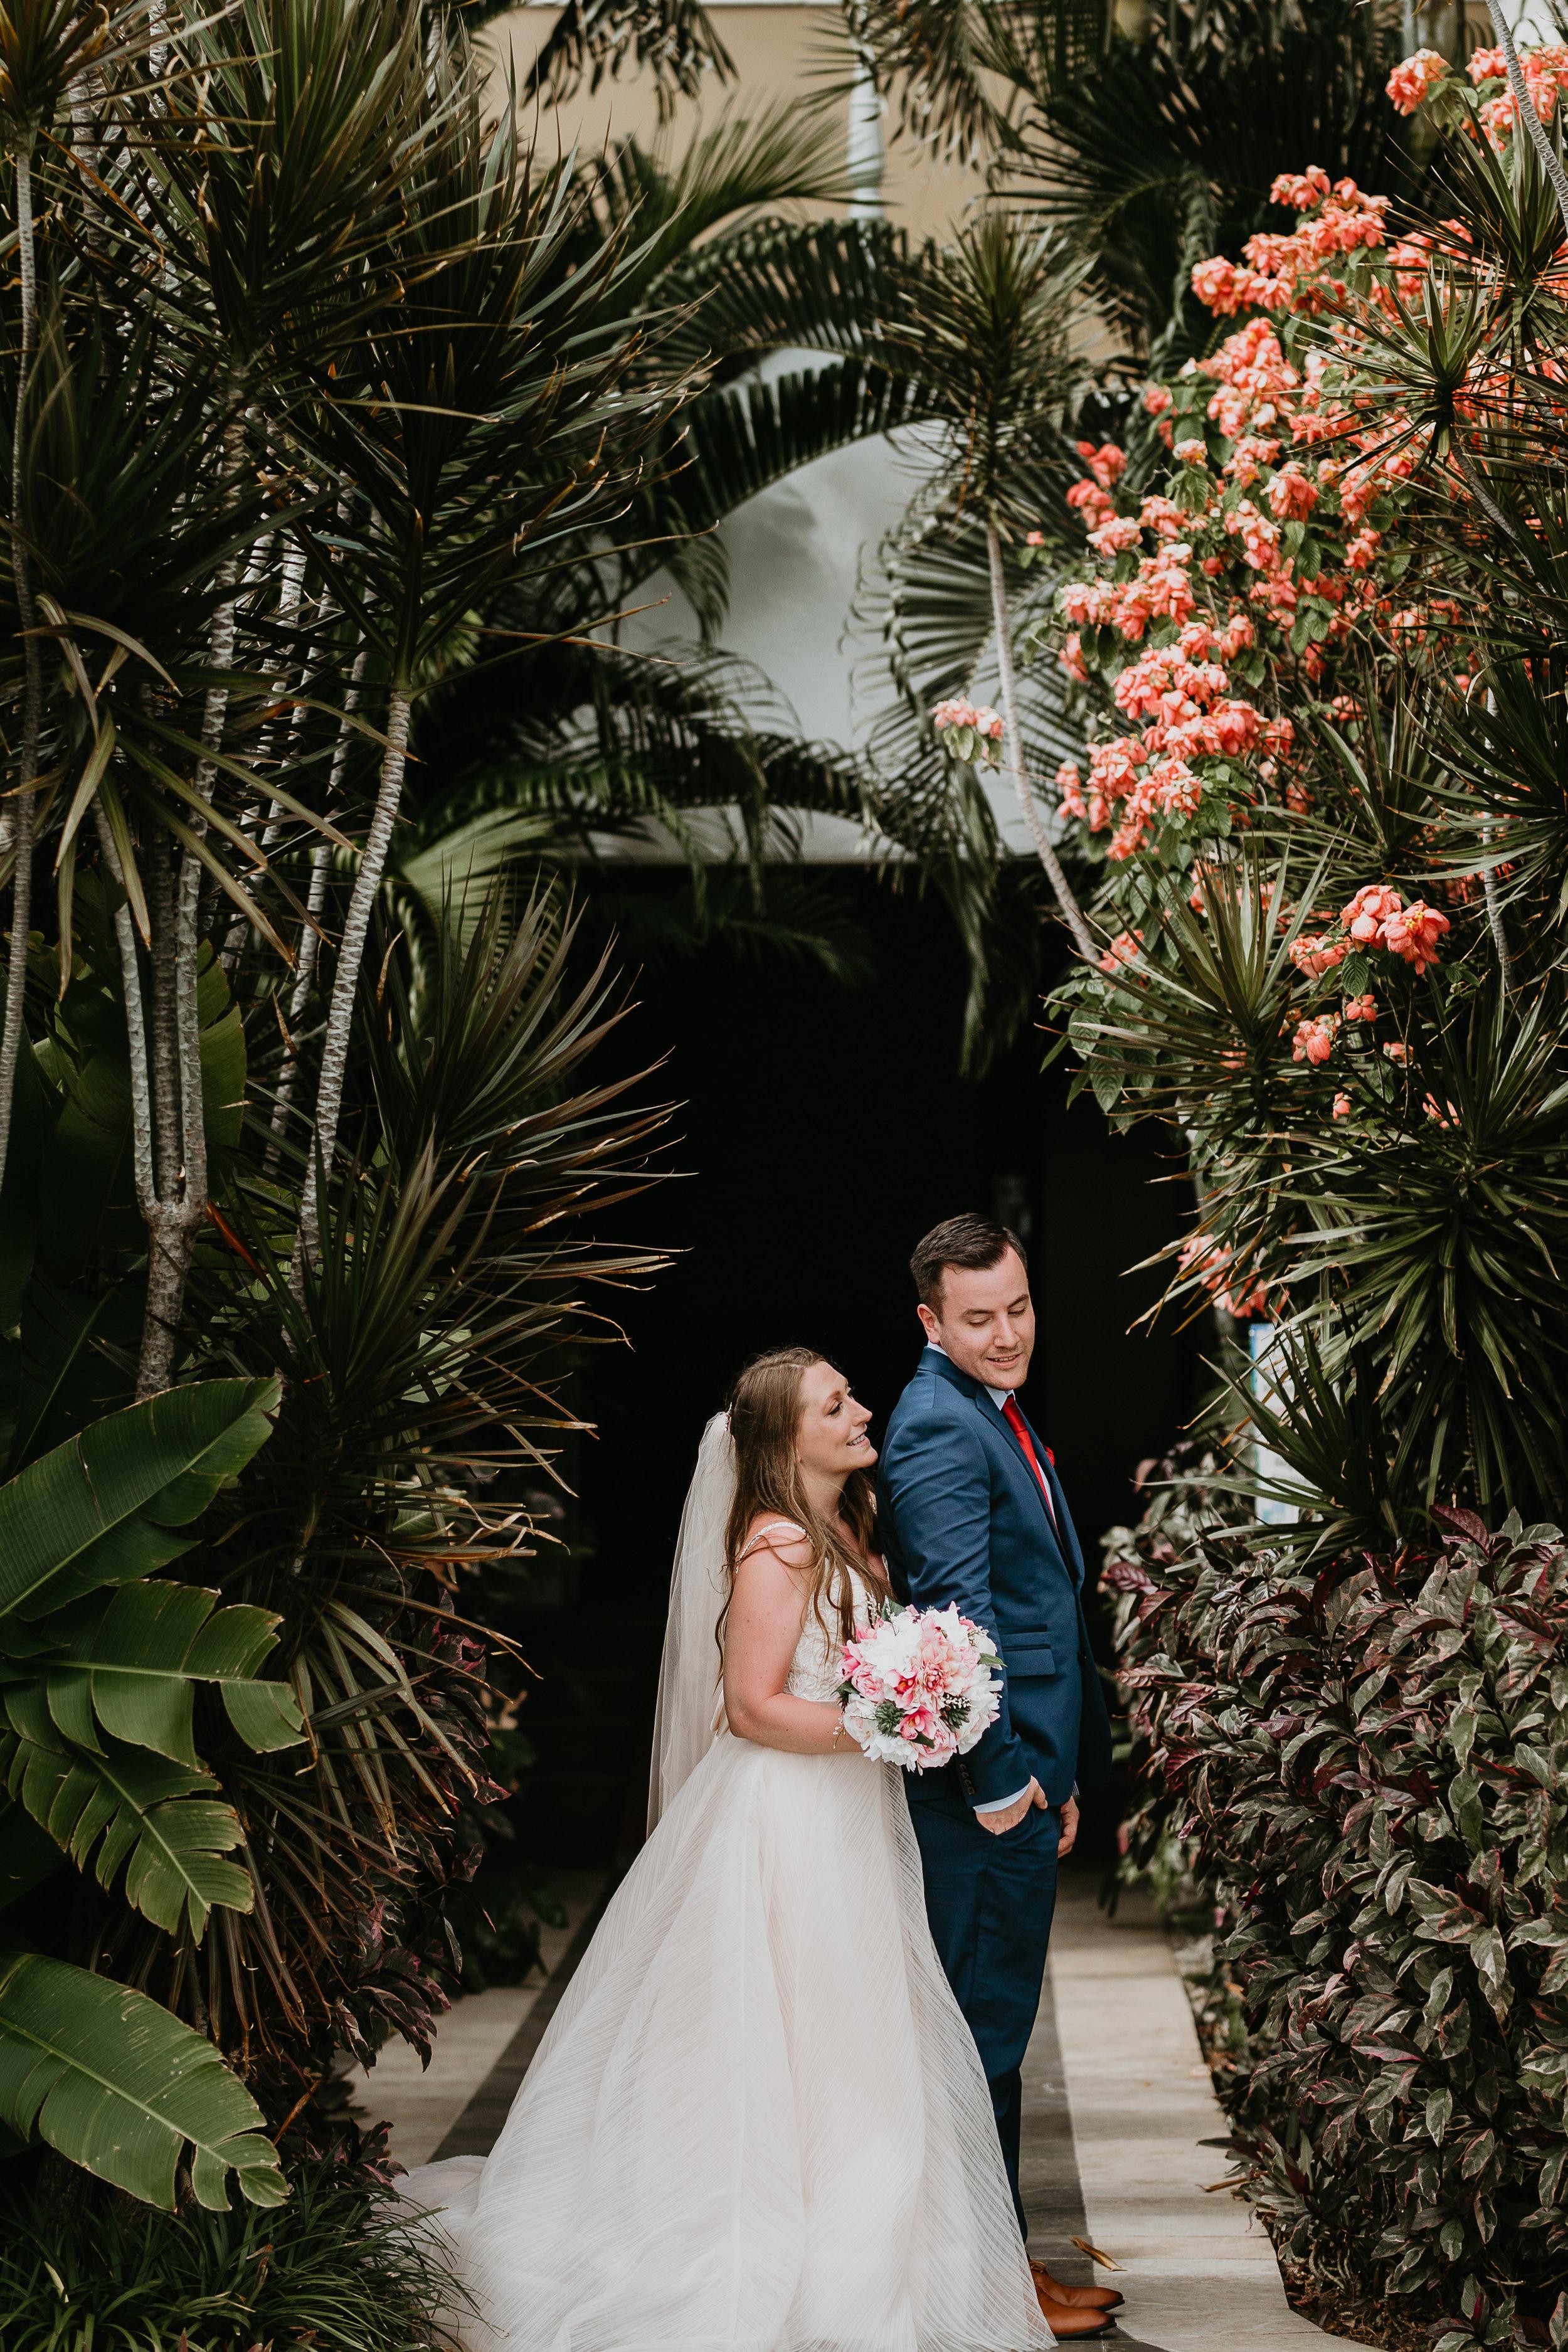 nicole-daacke-photography-destination-wedding-in-st-lucia-sandals-la-toc-intimate-island-wedding-carribean-elopement-photographer-chill-island-wedding-42.jpg